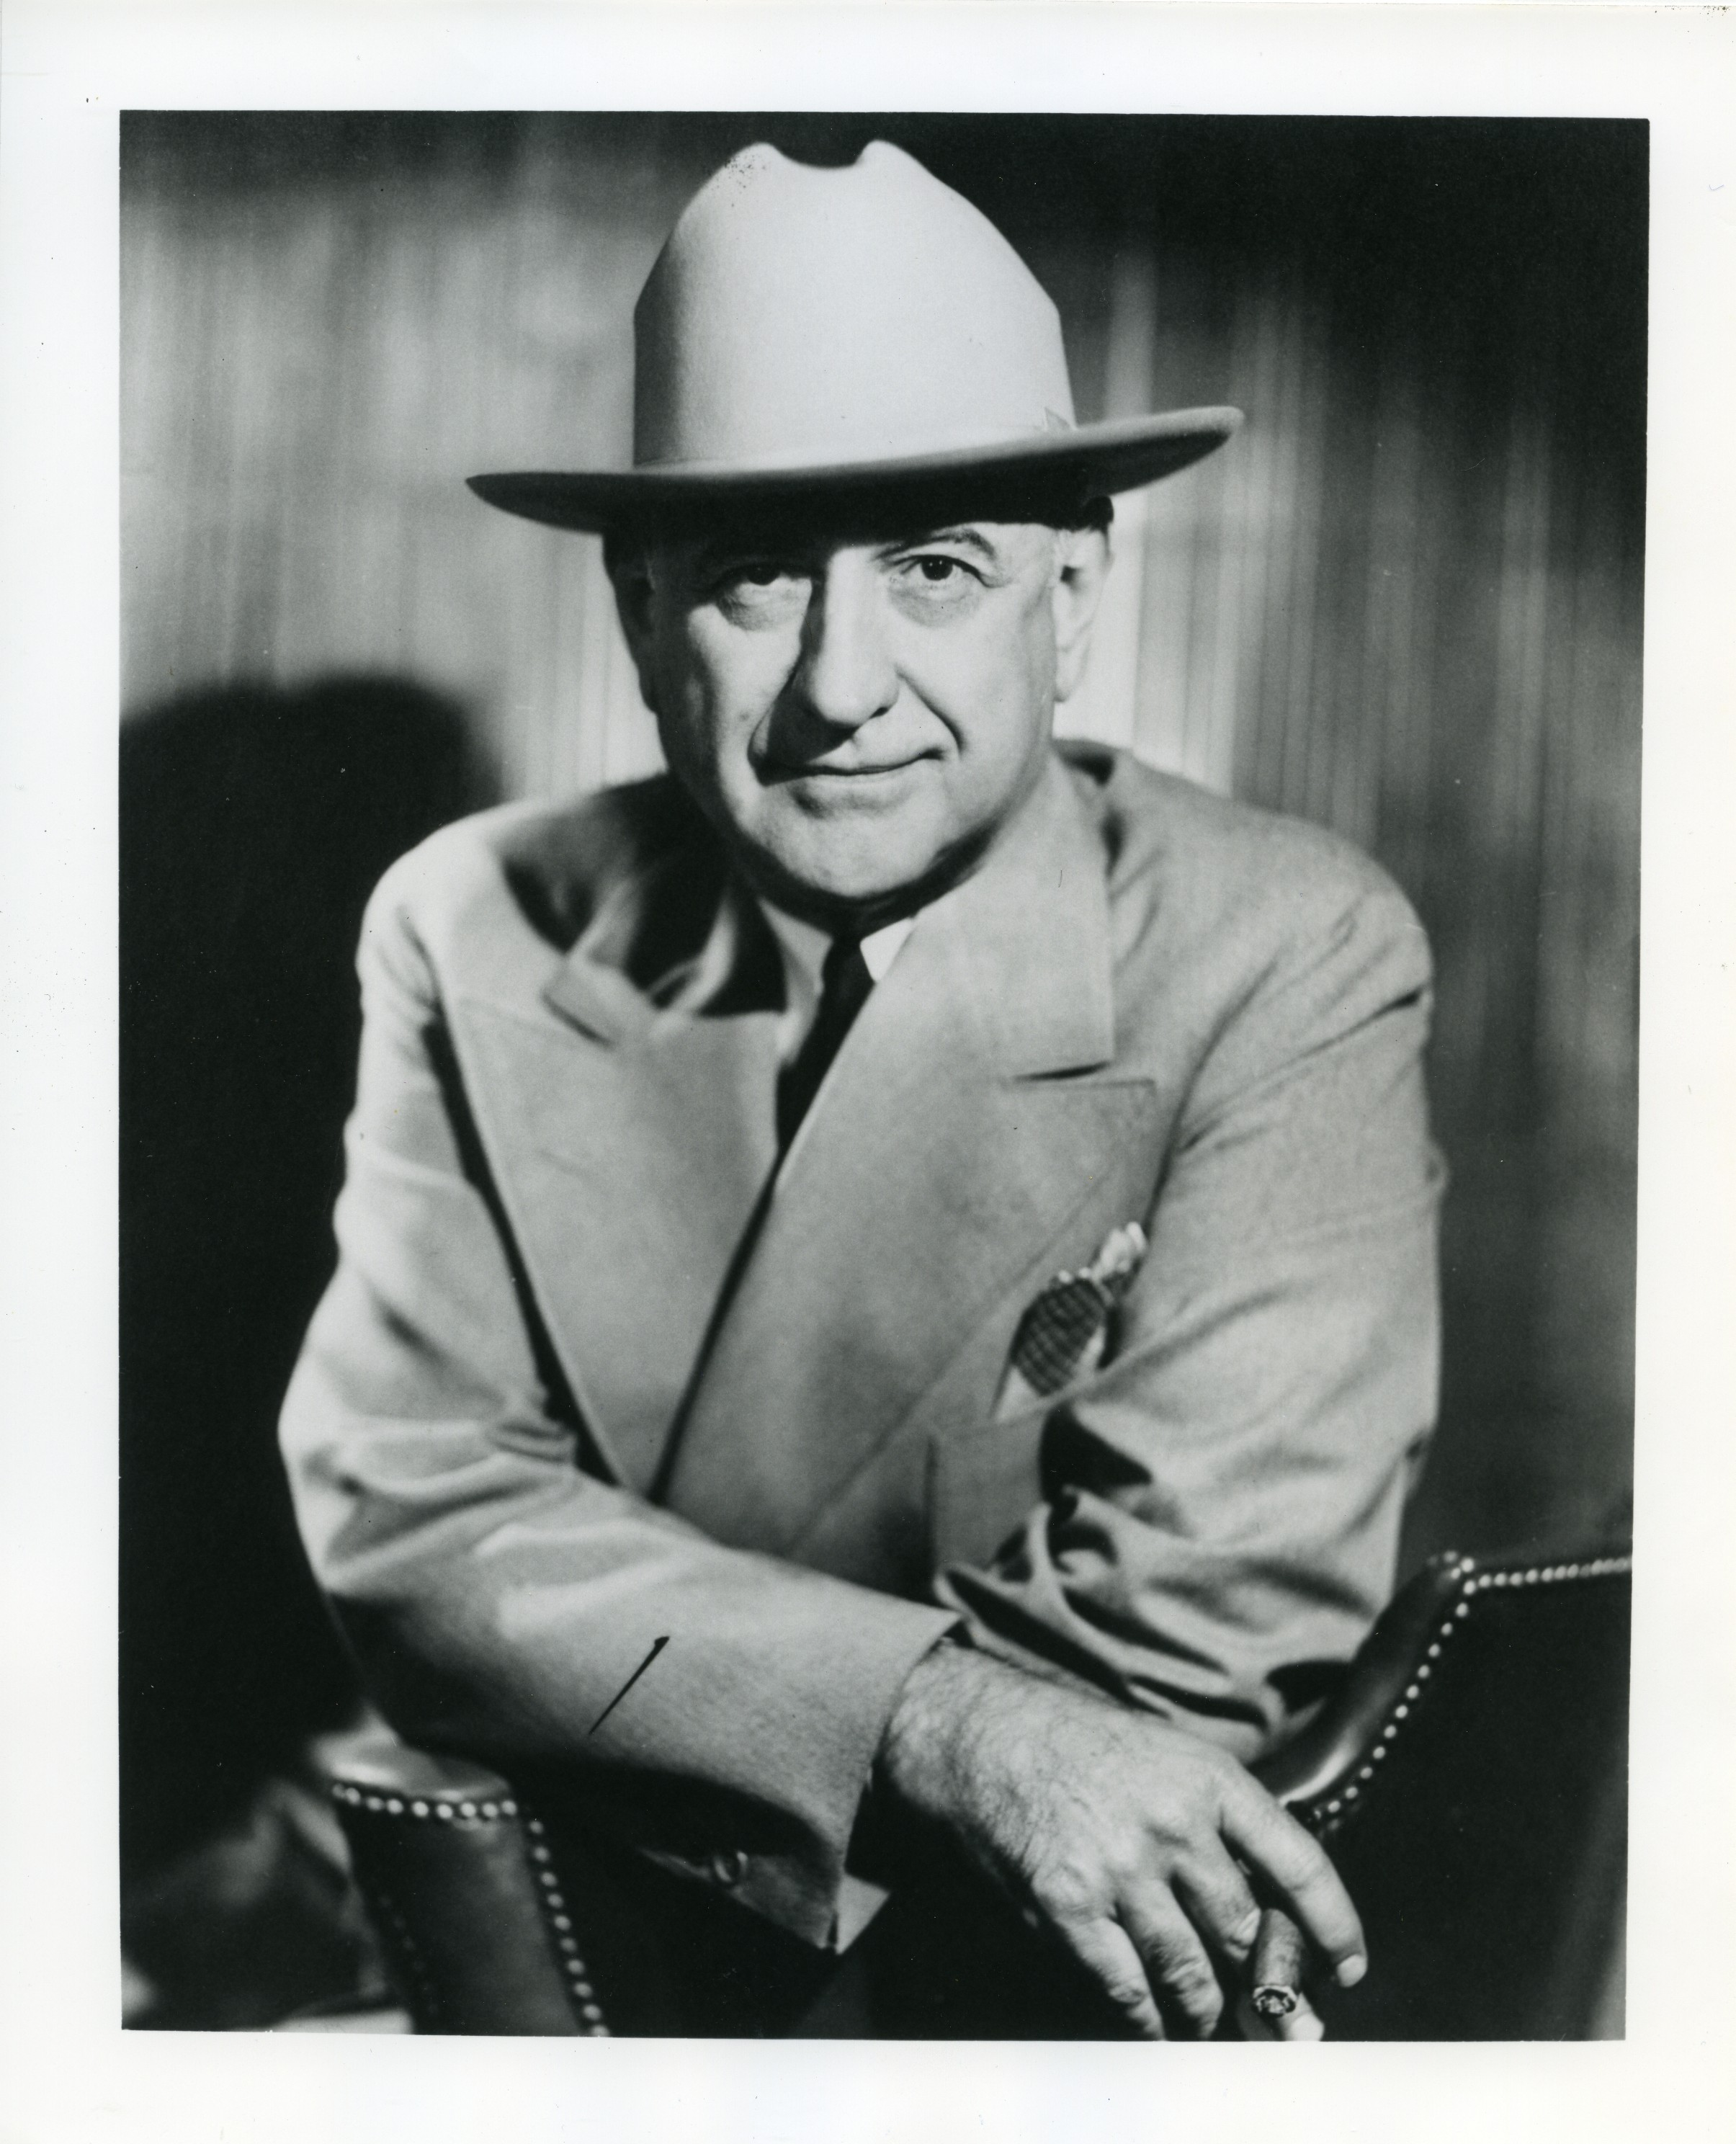 Carter_Amon_G_Portraits_1927-1953_002.jpg